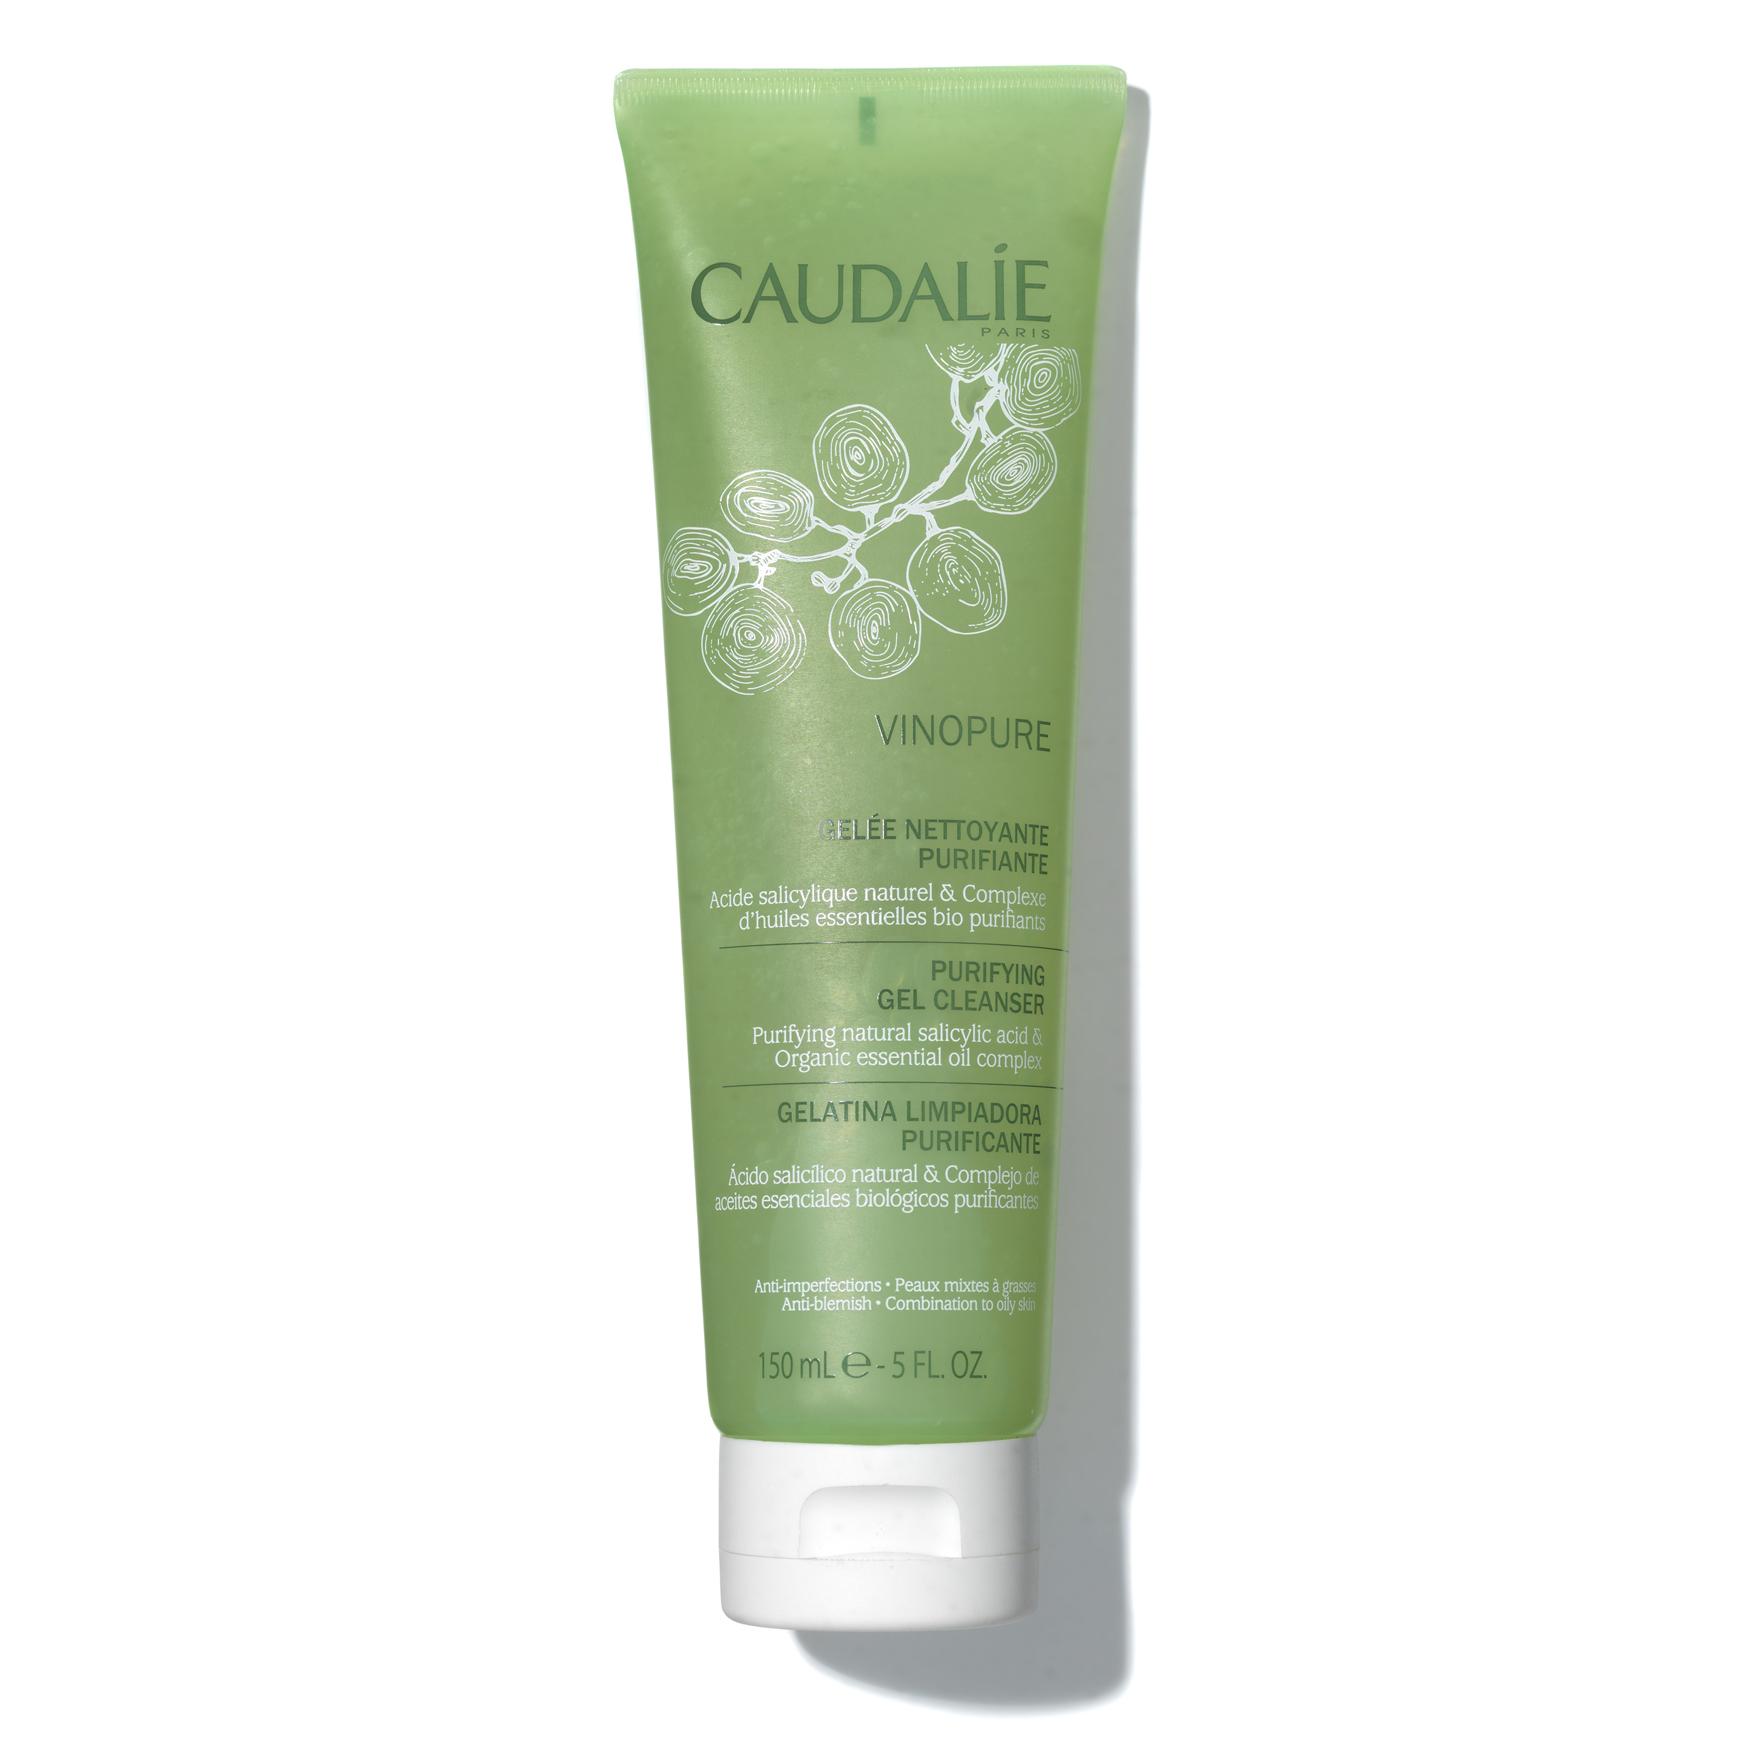 Vinopure Pore Purifying Gel Cleanser by Caudalie #3